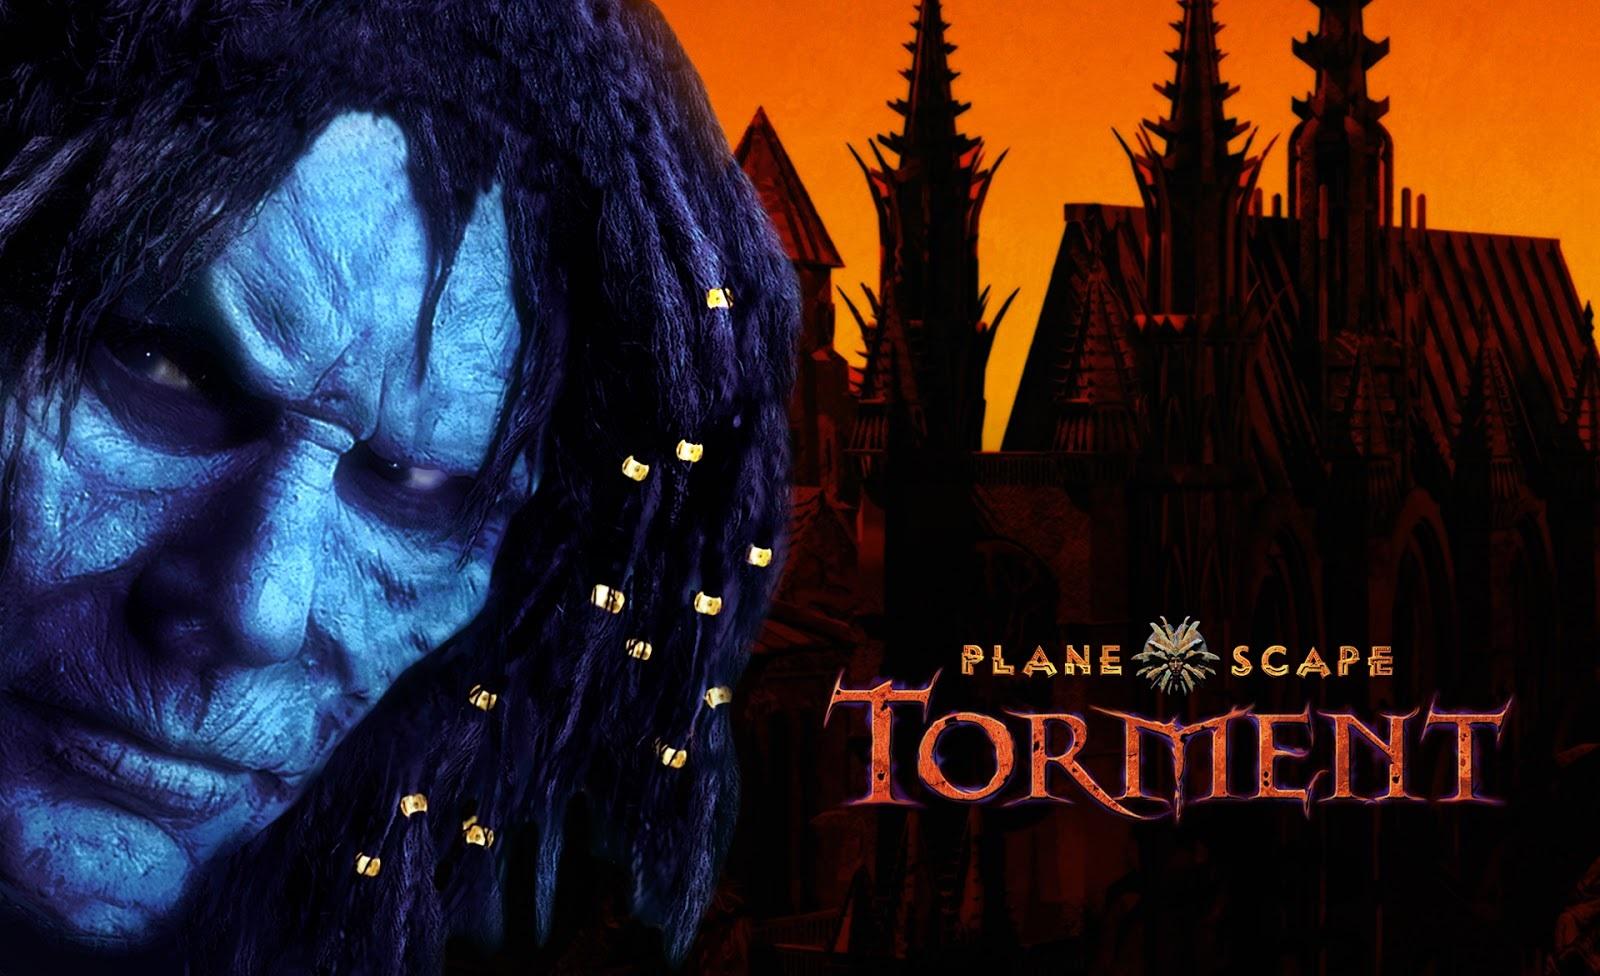 Planescape Torment Free Download